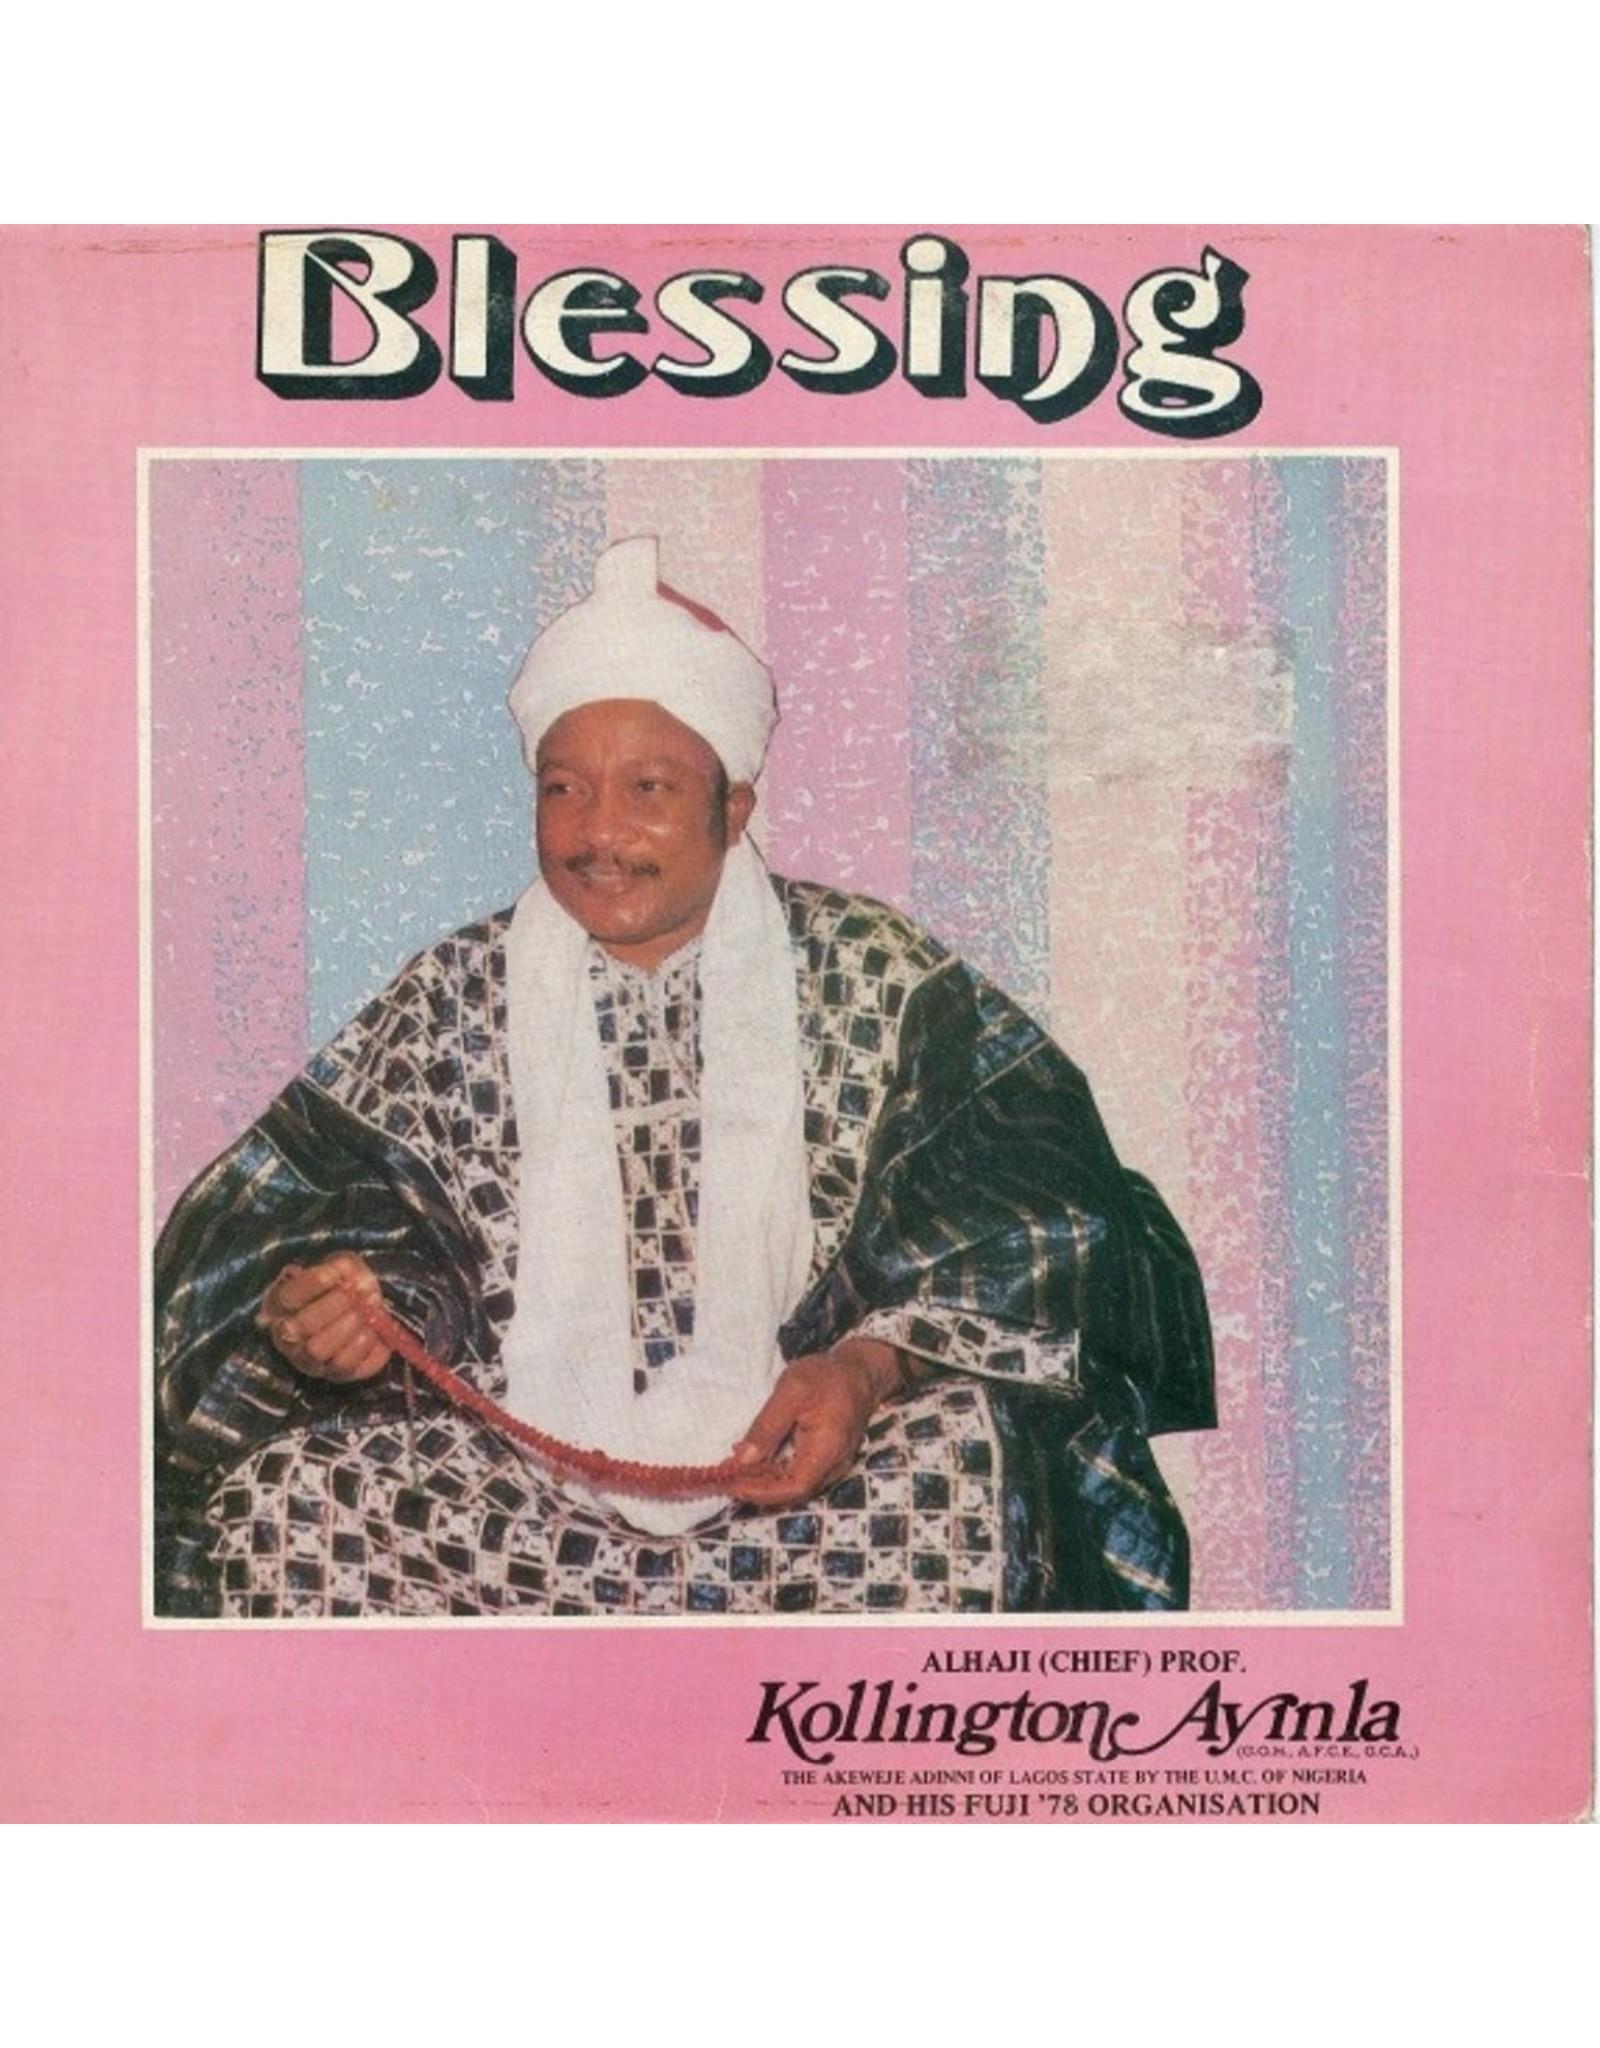 Kollington Ayinla & His Fuji '78 Organisation - Blessing LP